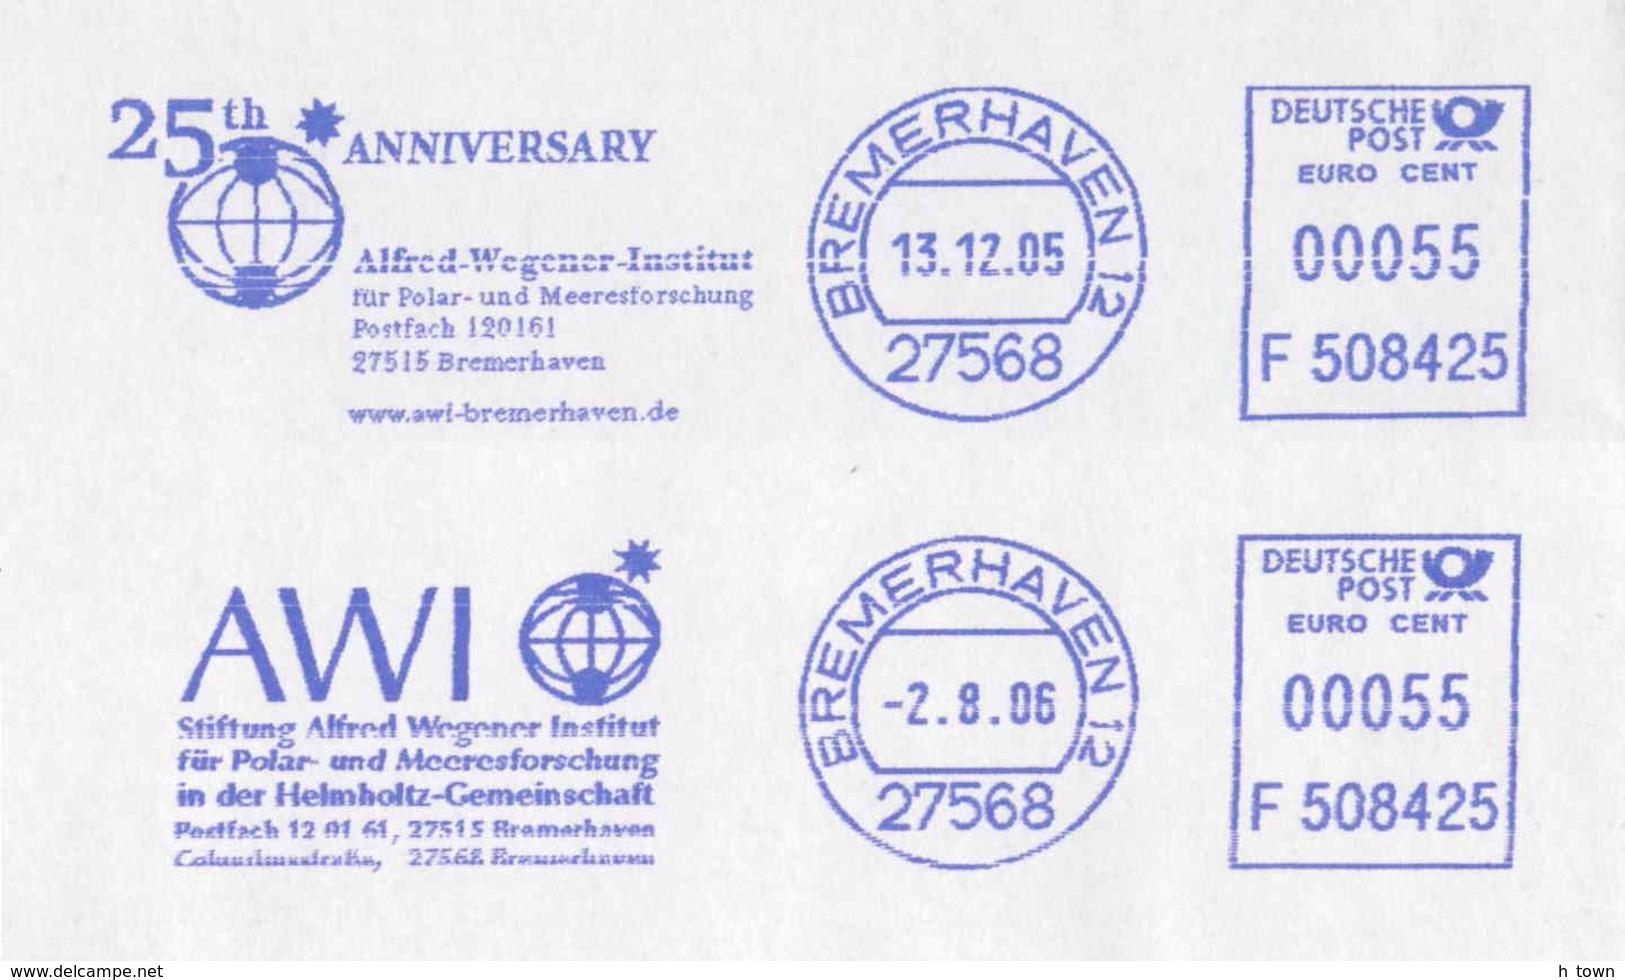 8190  Institut Alfred Wegener, Recherche Polaire Et Marine: 2 Ema - Polar And Marine Research Inst. Geology Meteorology - Research Programs